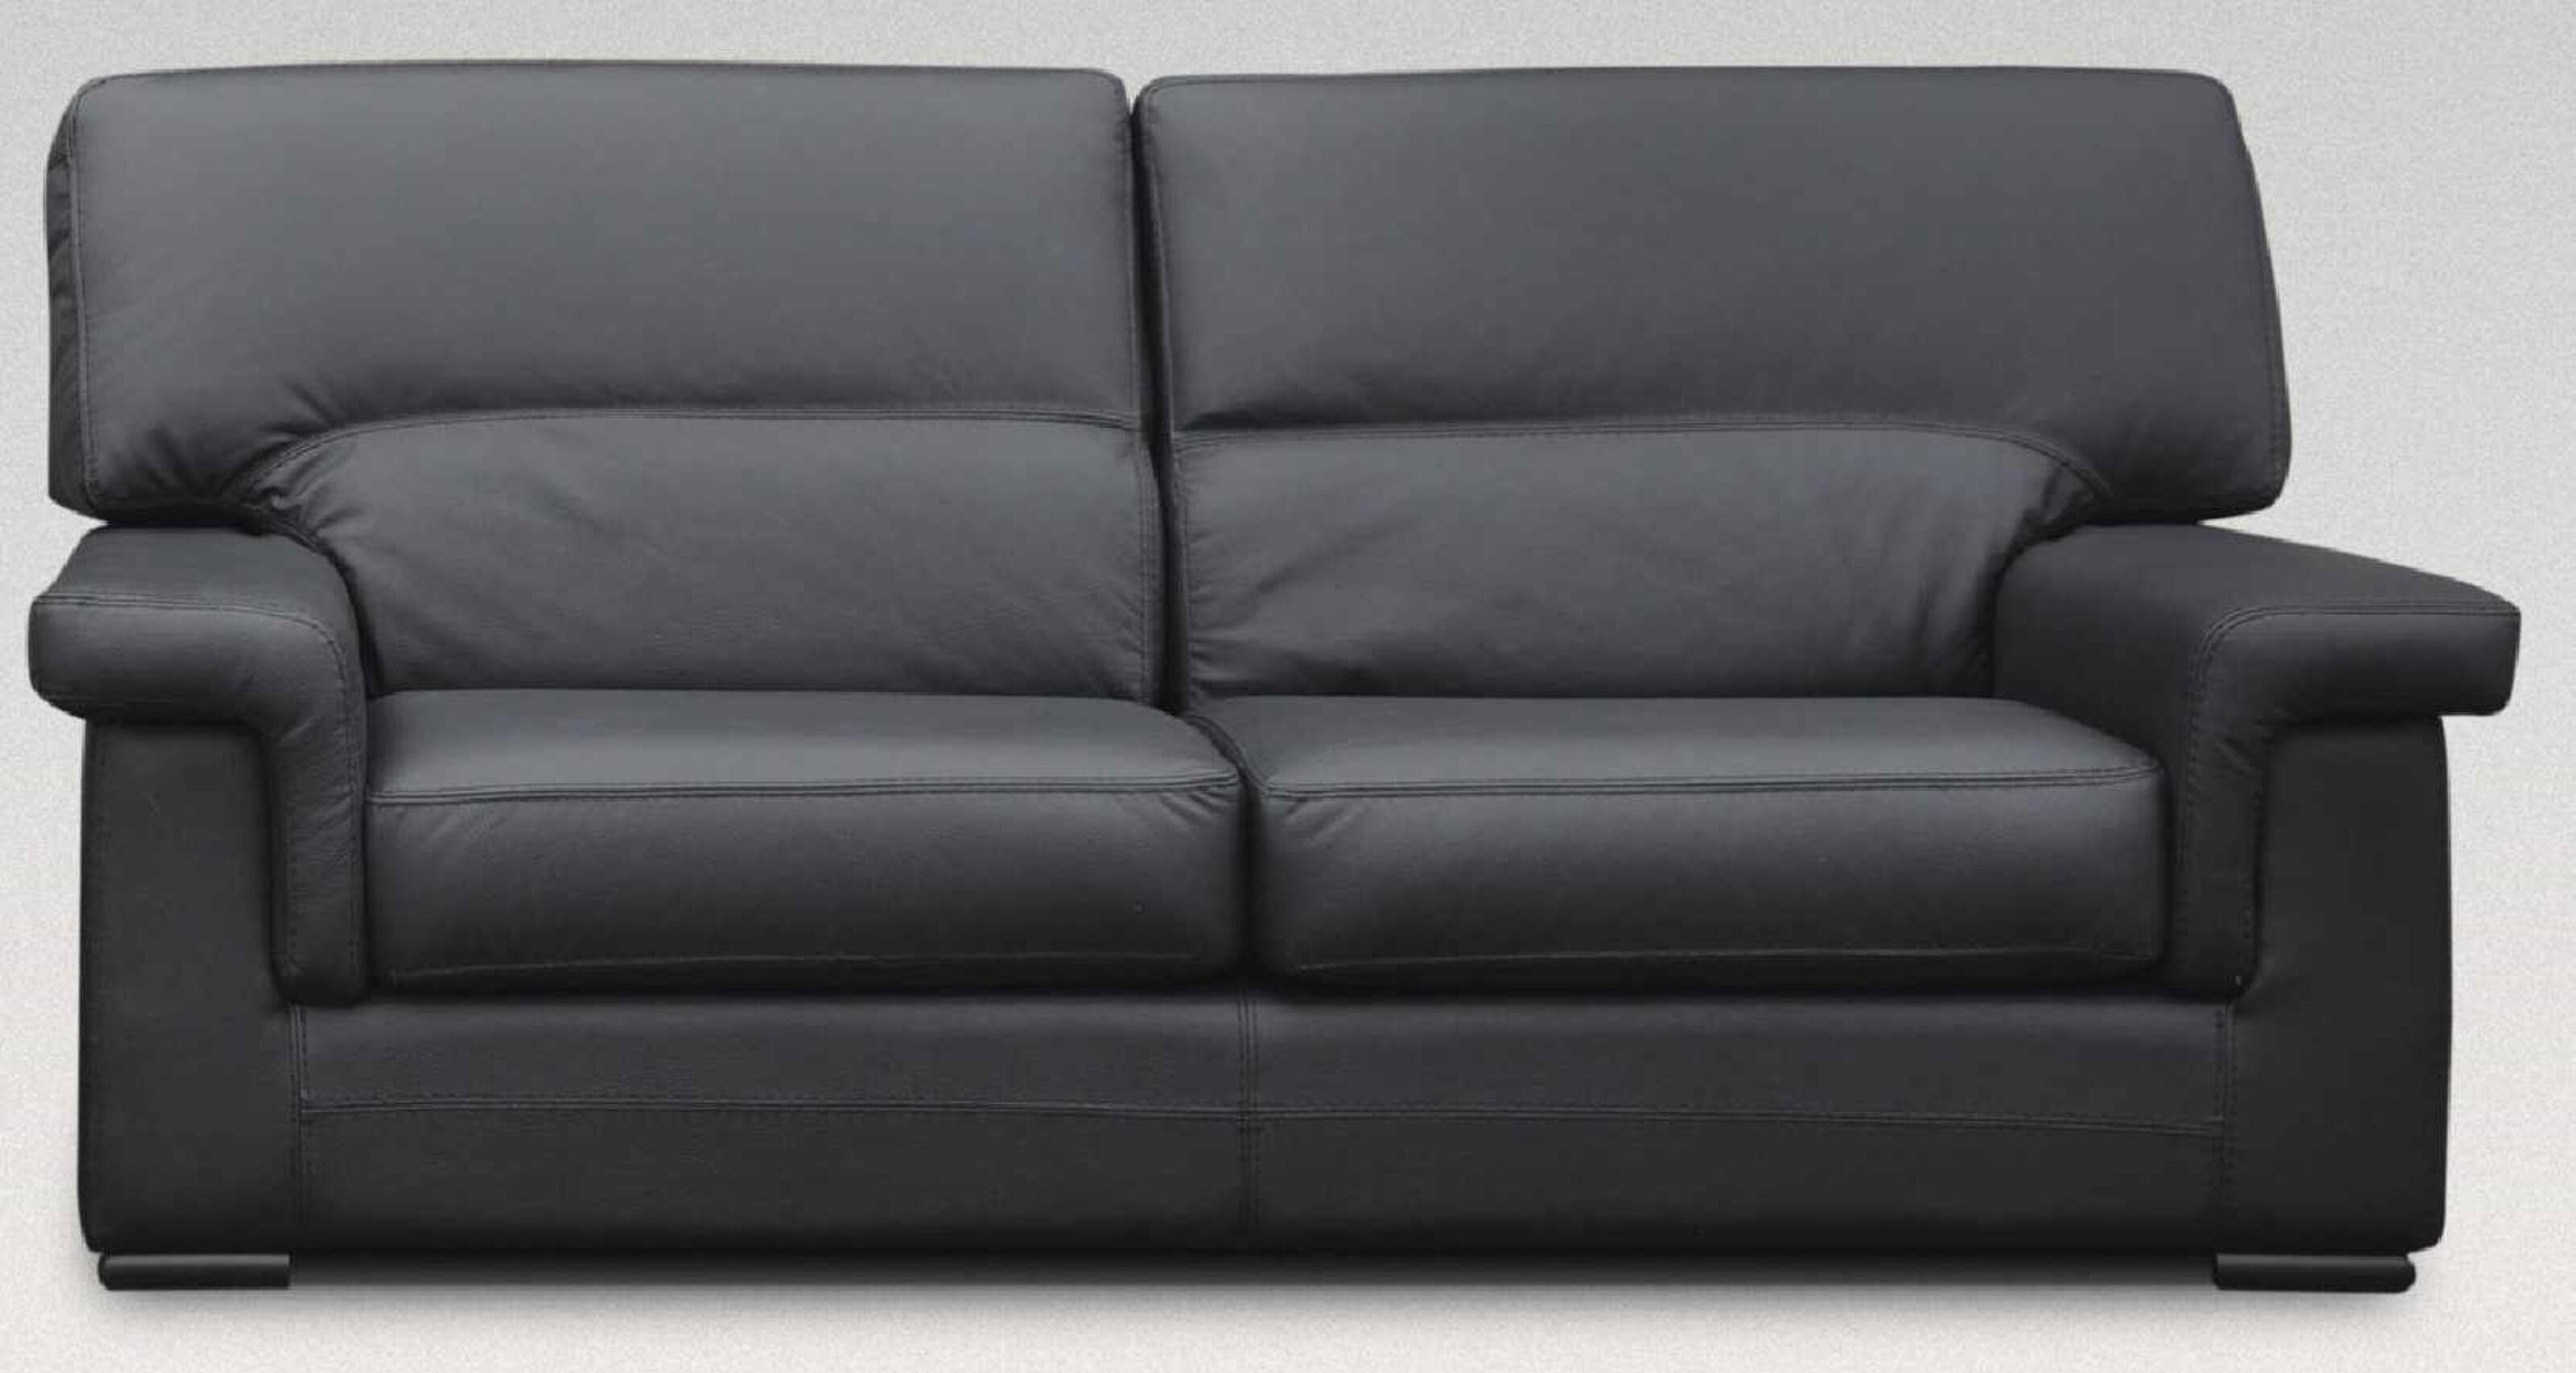 Orleans 3 Seater Italian Leather Black Sofa Settee